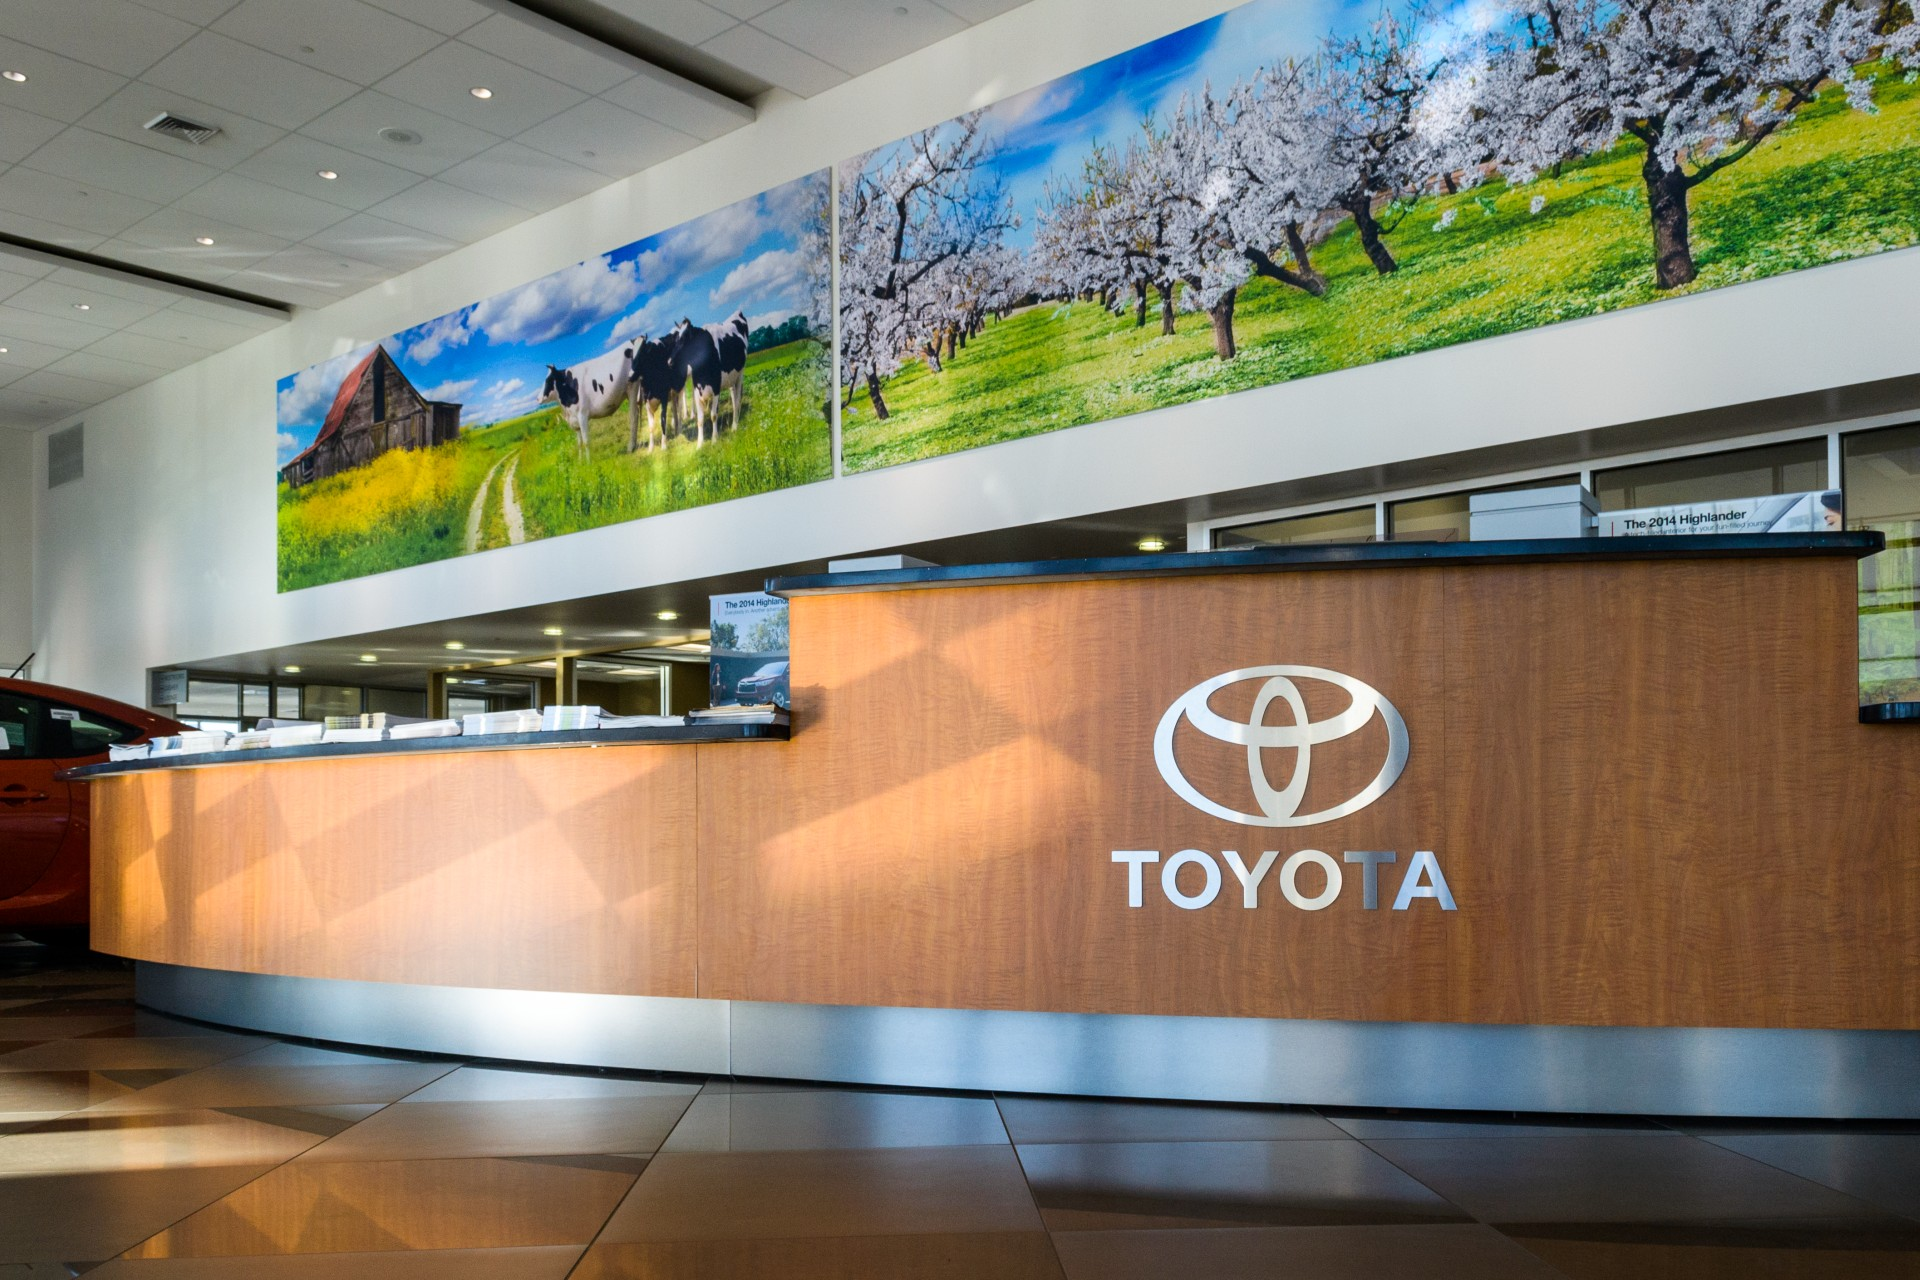 Toyota-4.jpg